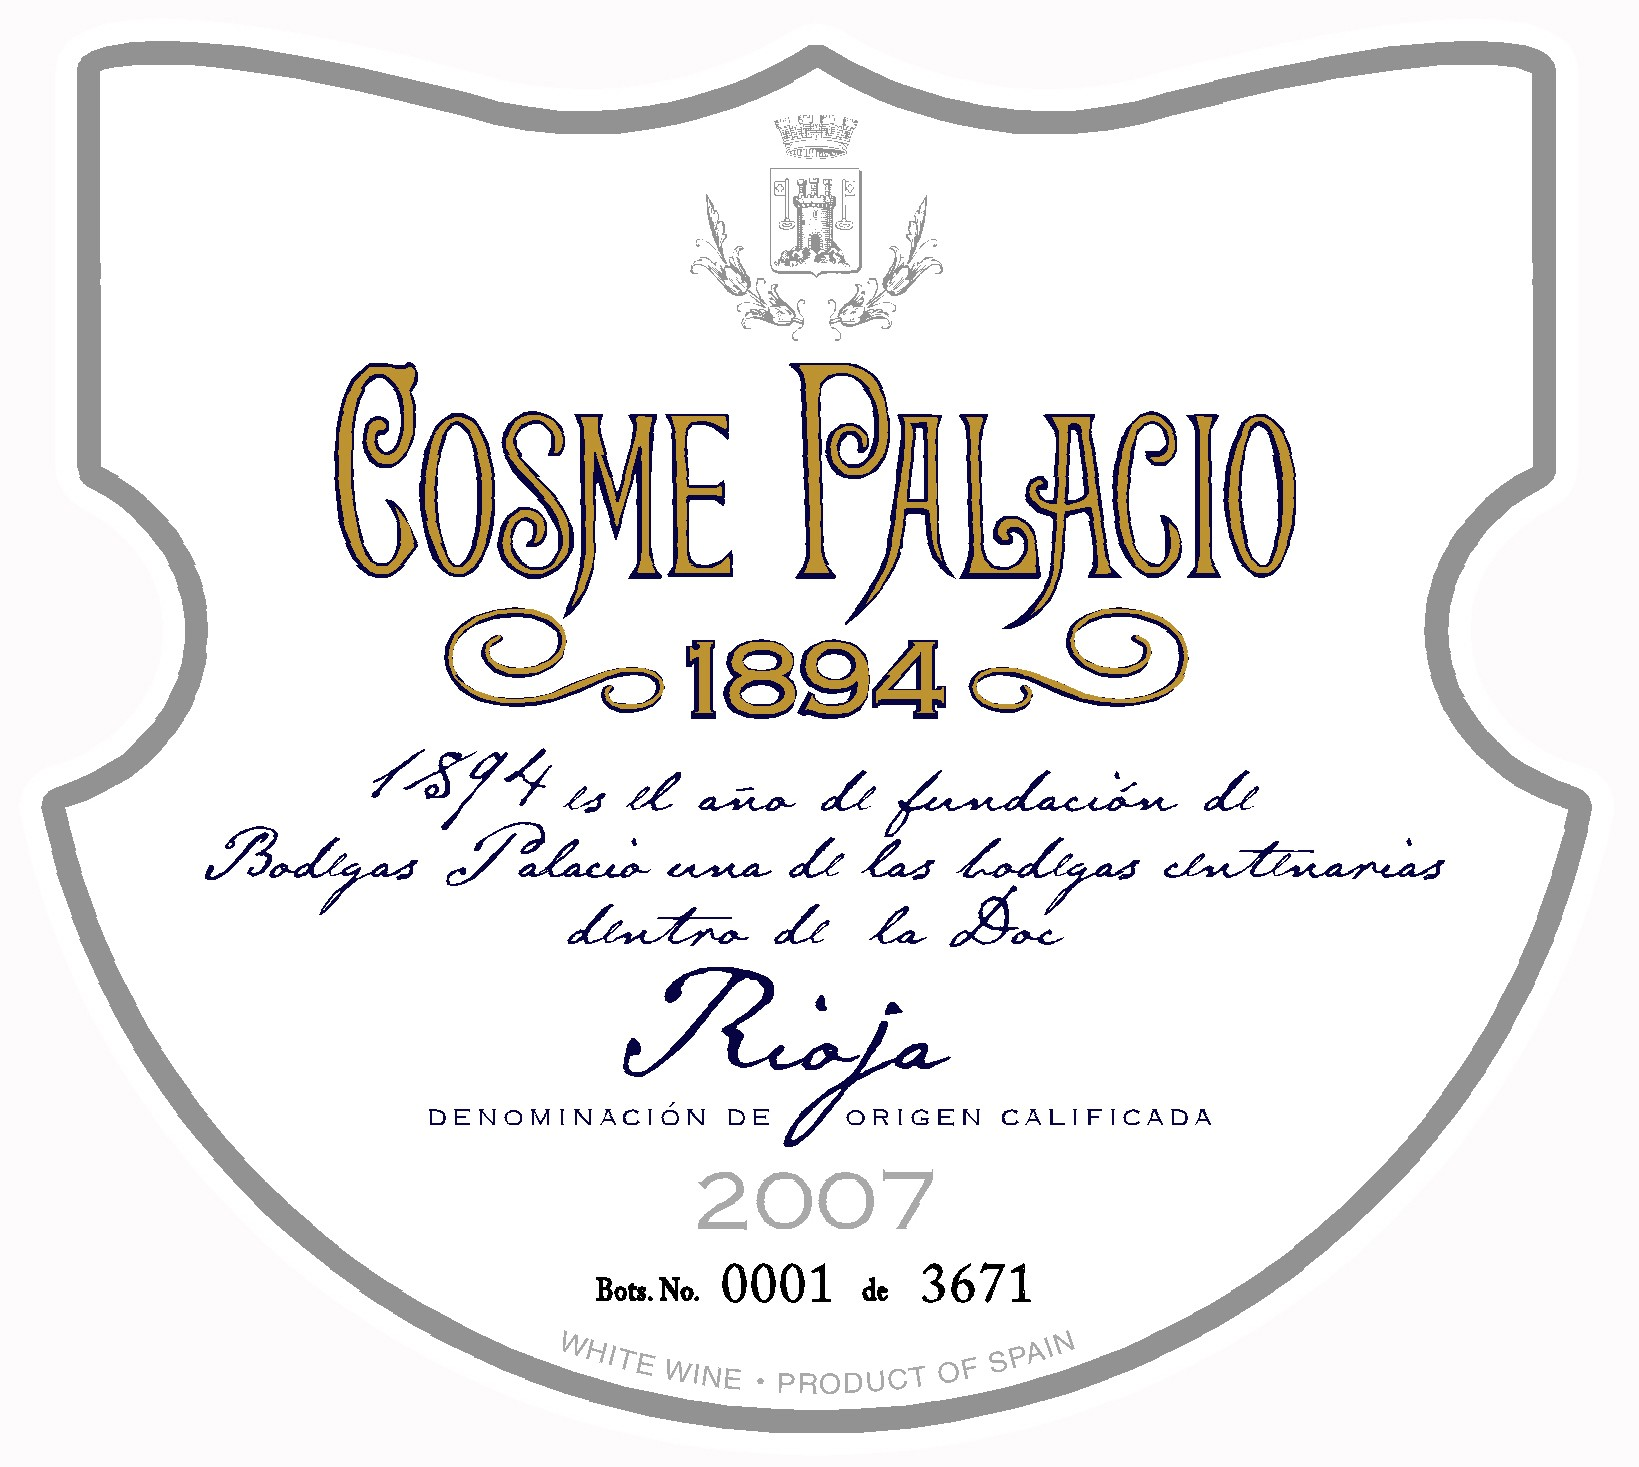 Cosme Palacio etiqueta